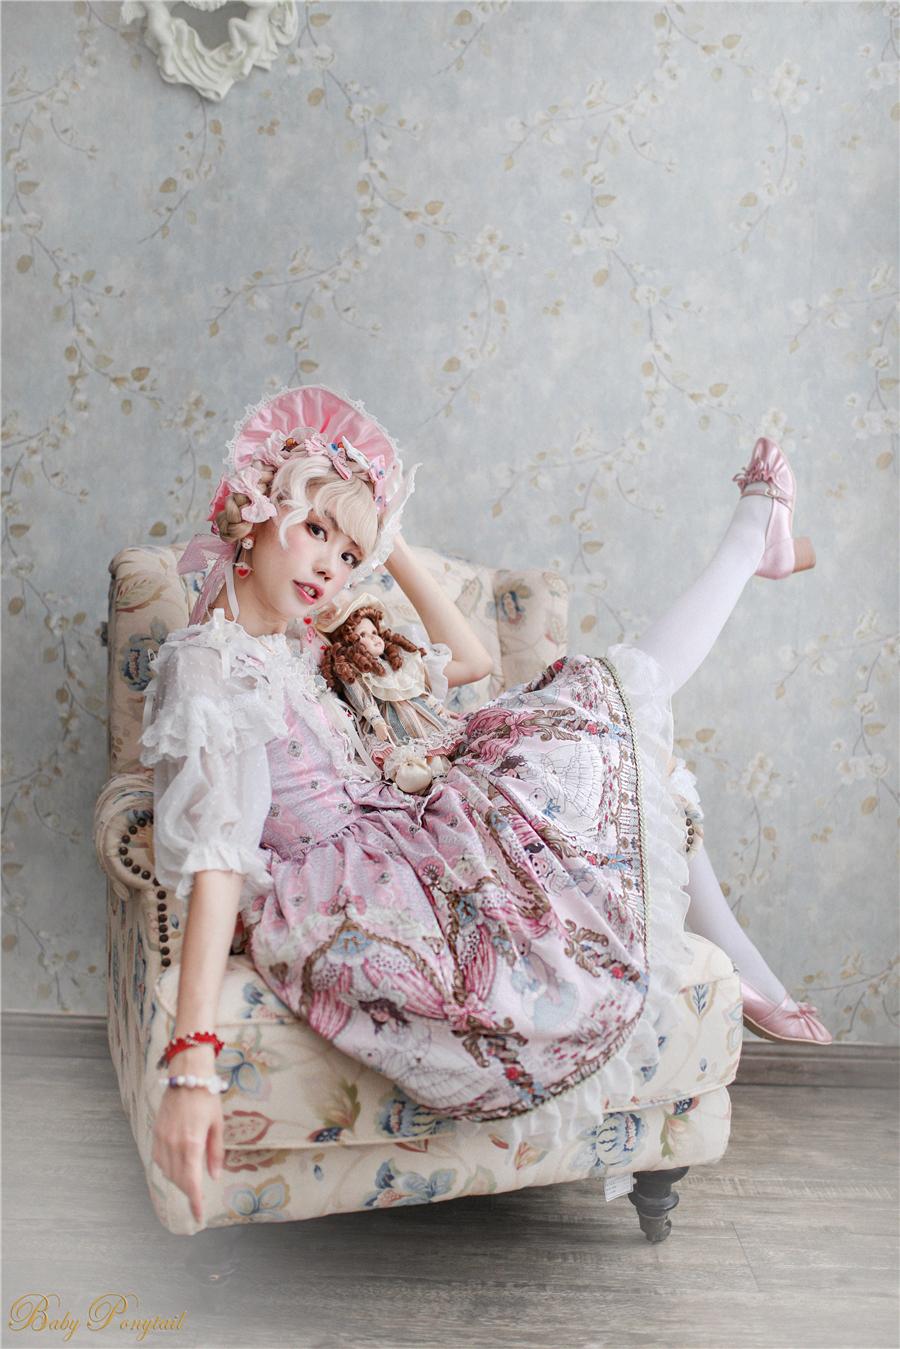 BabyPonytail_Model Photo_My Favorite Companion_JSK Pink_Kaka_05.jpg